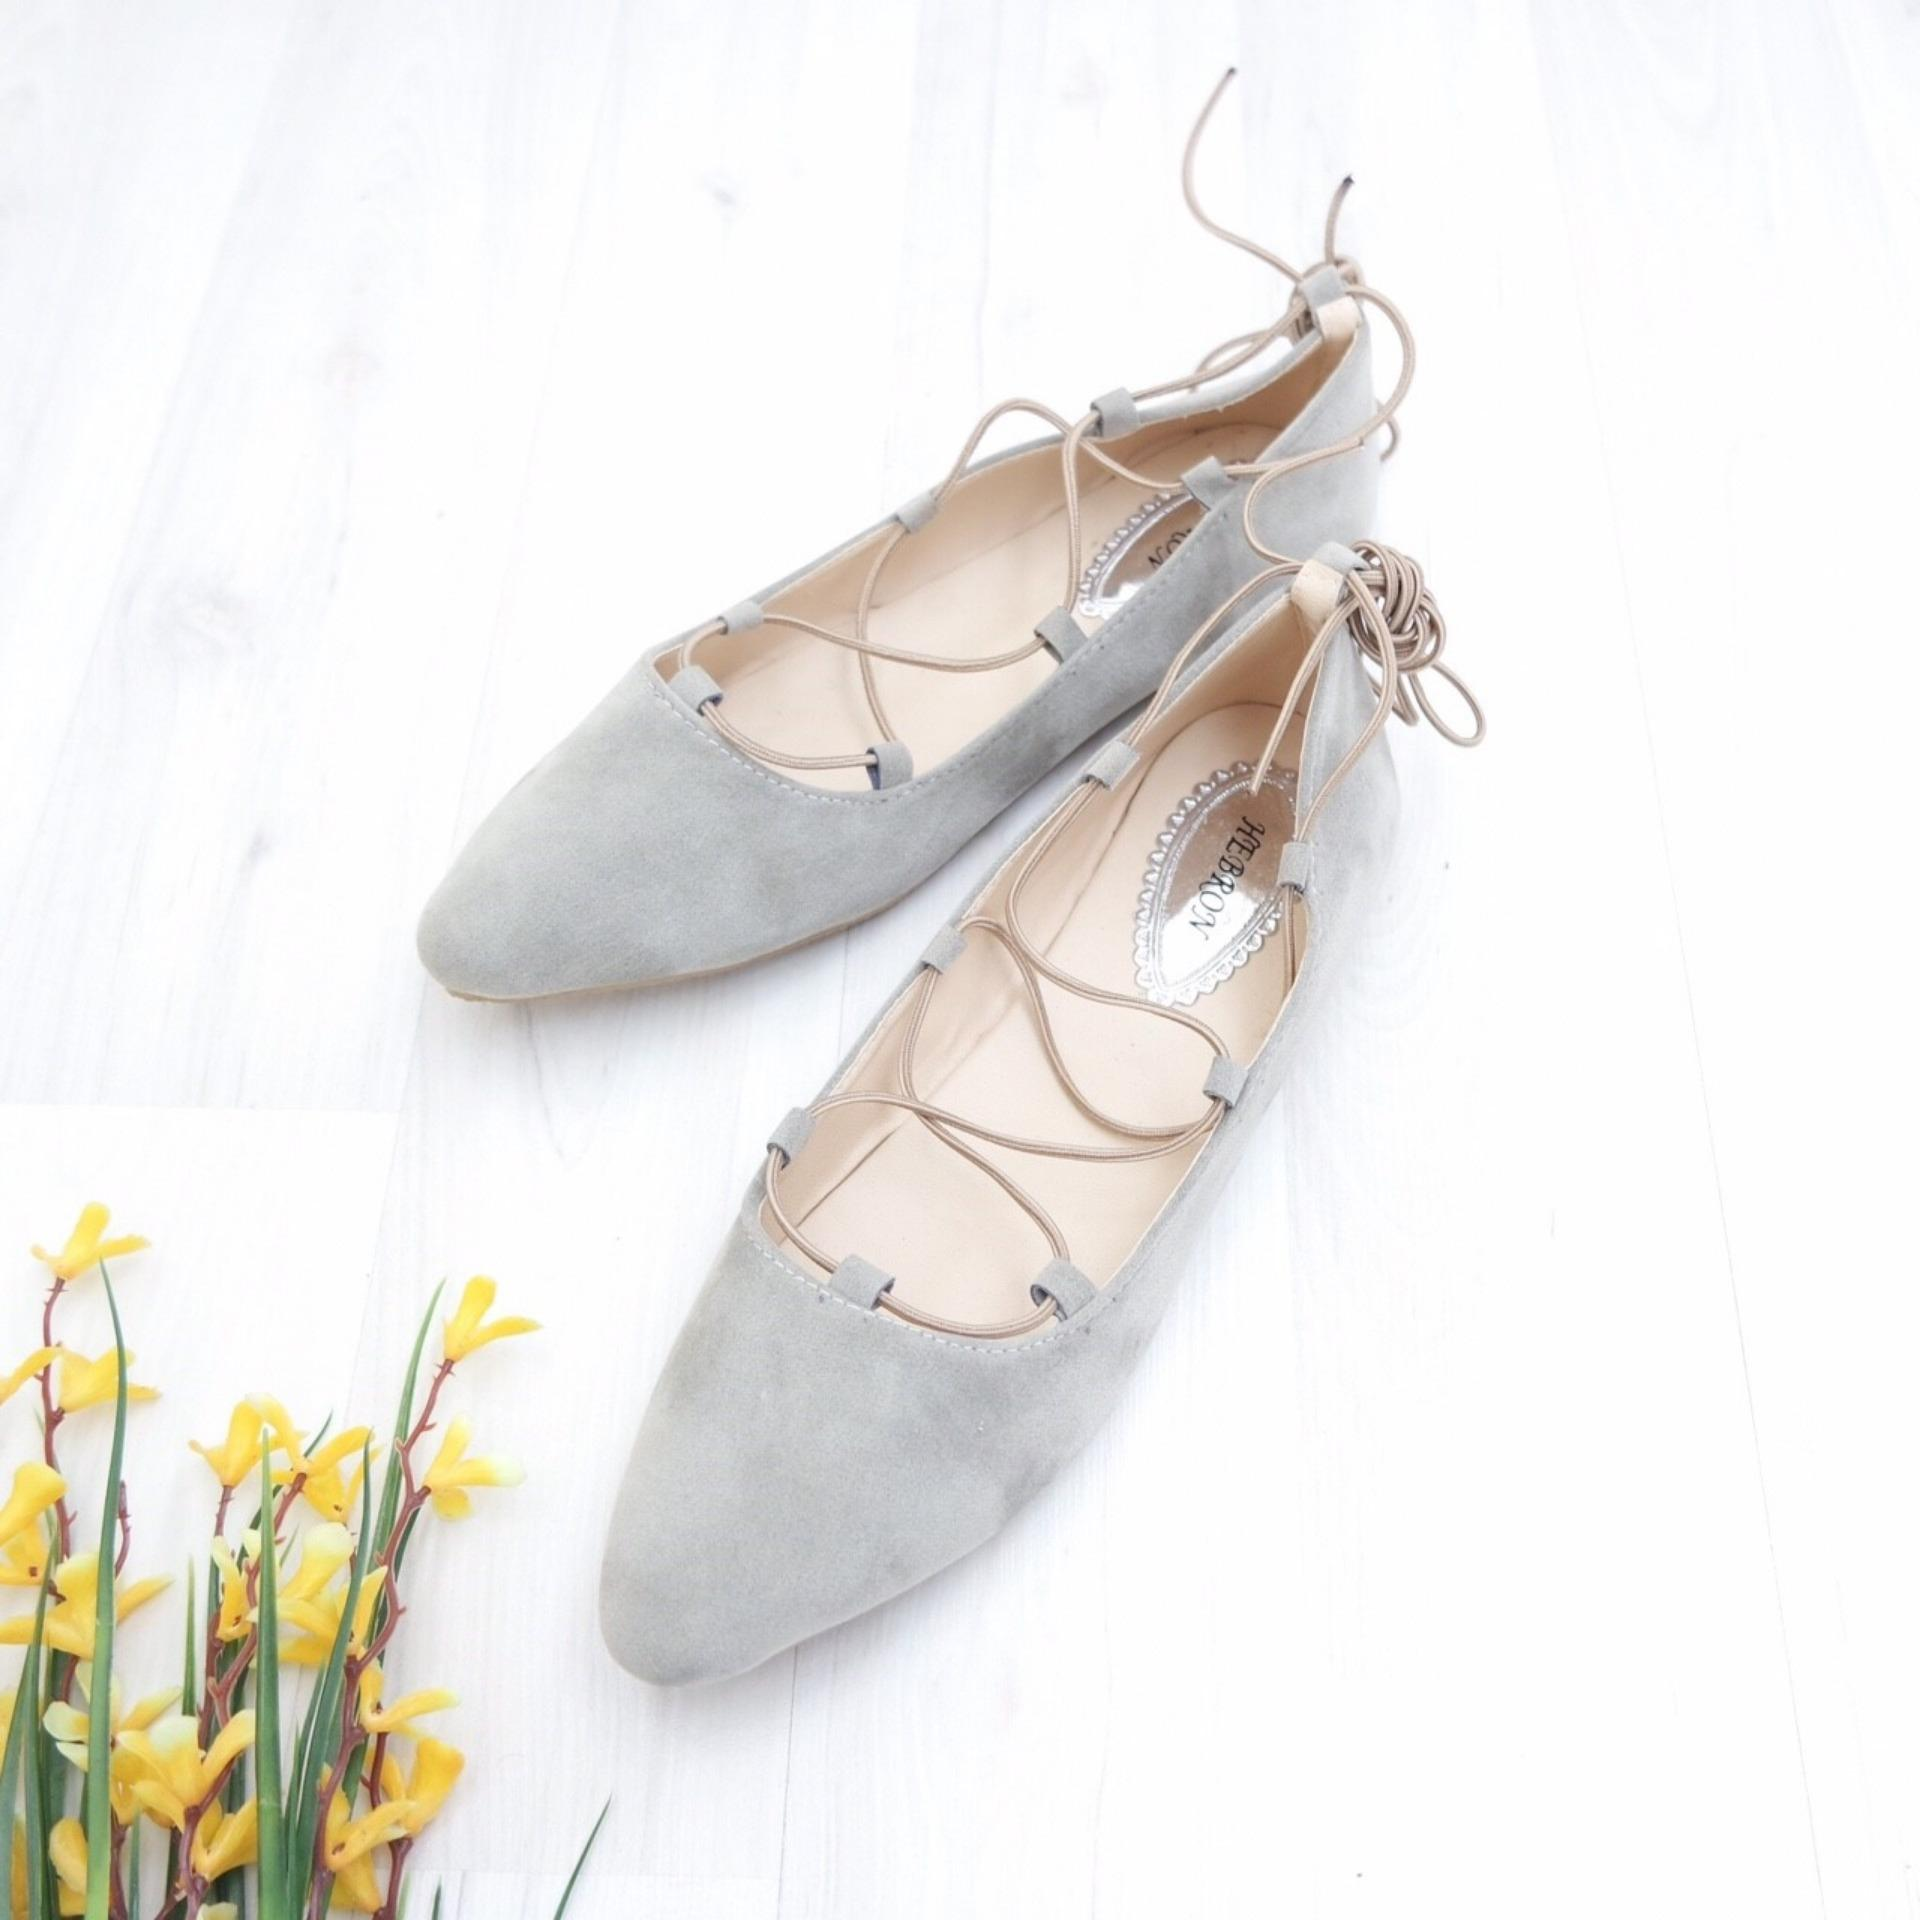 KelinciMadu-Ballerina Flatshoes-Grey .